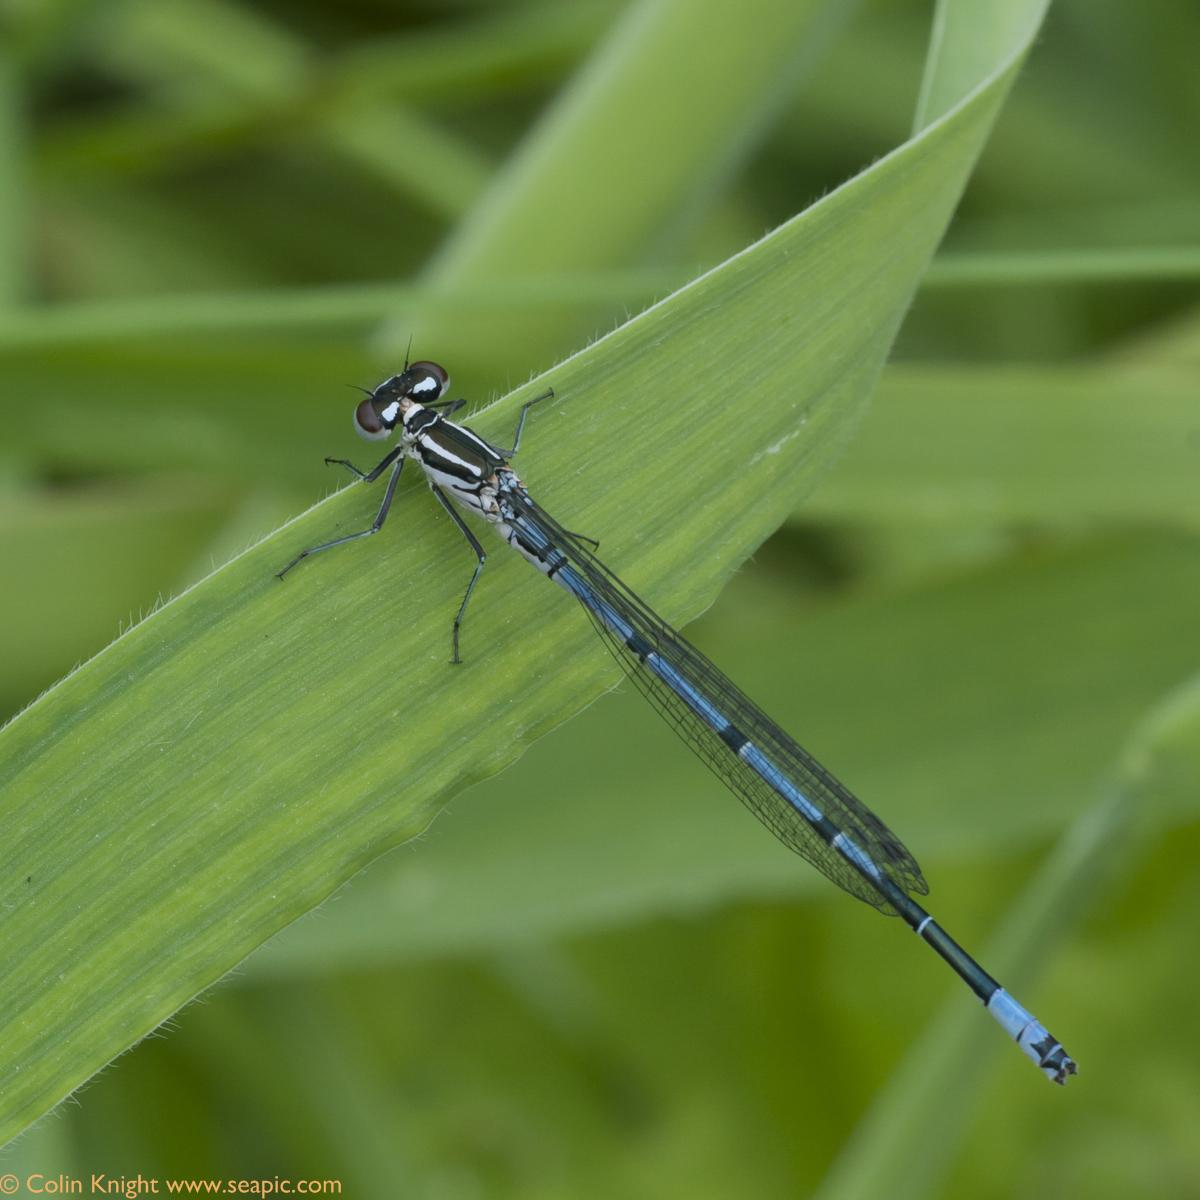 azure damsel flies fly - photo #18